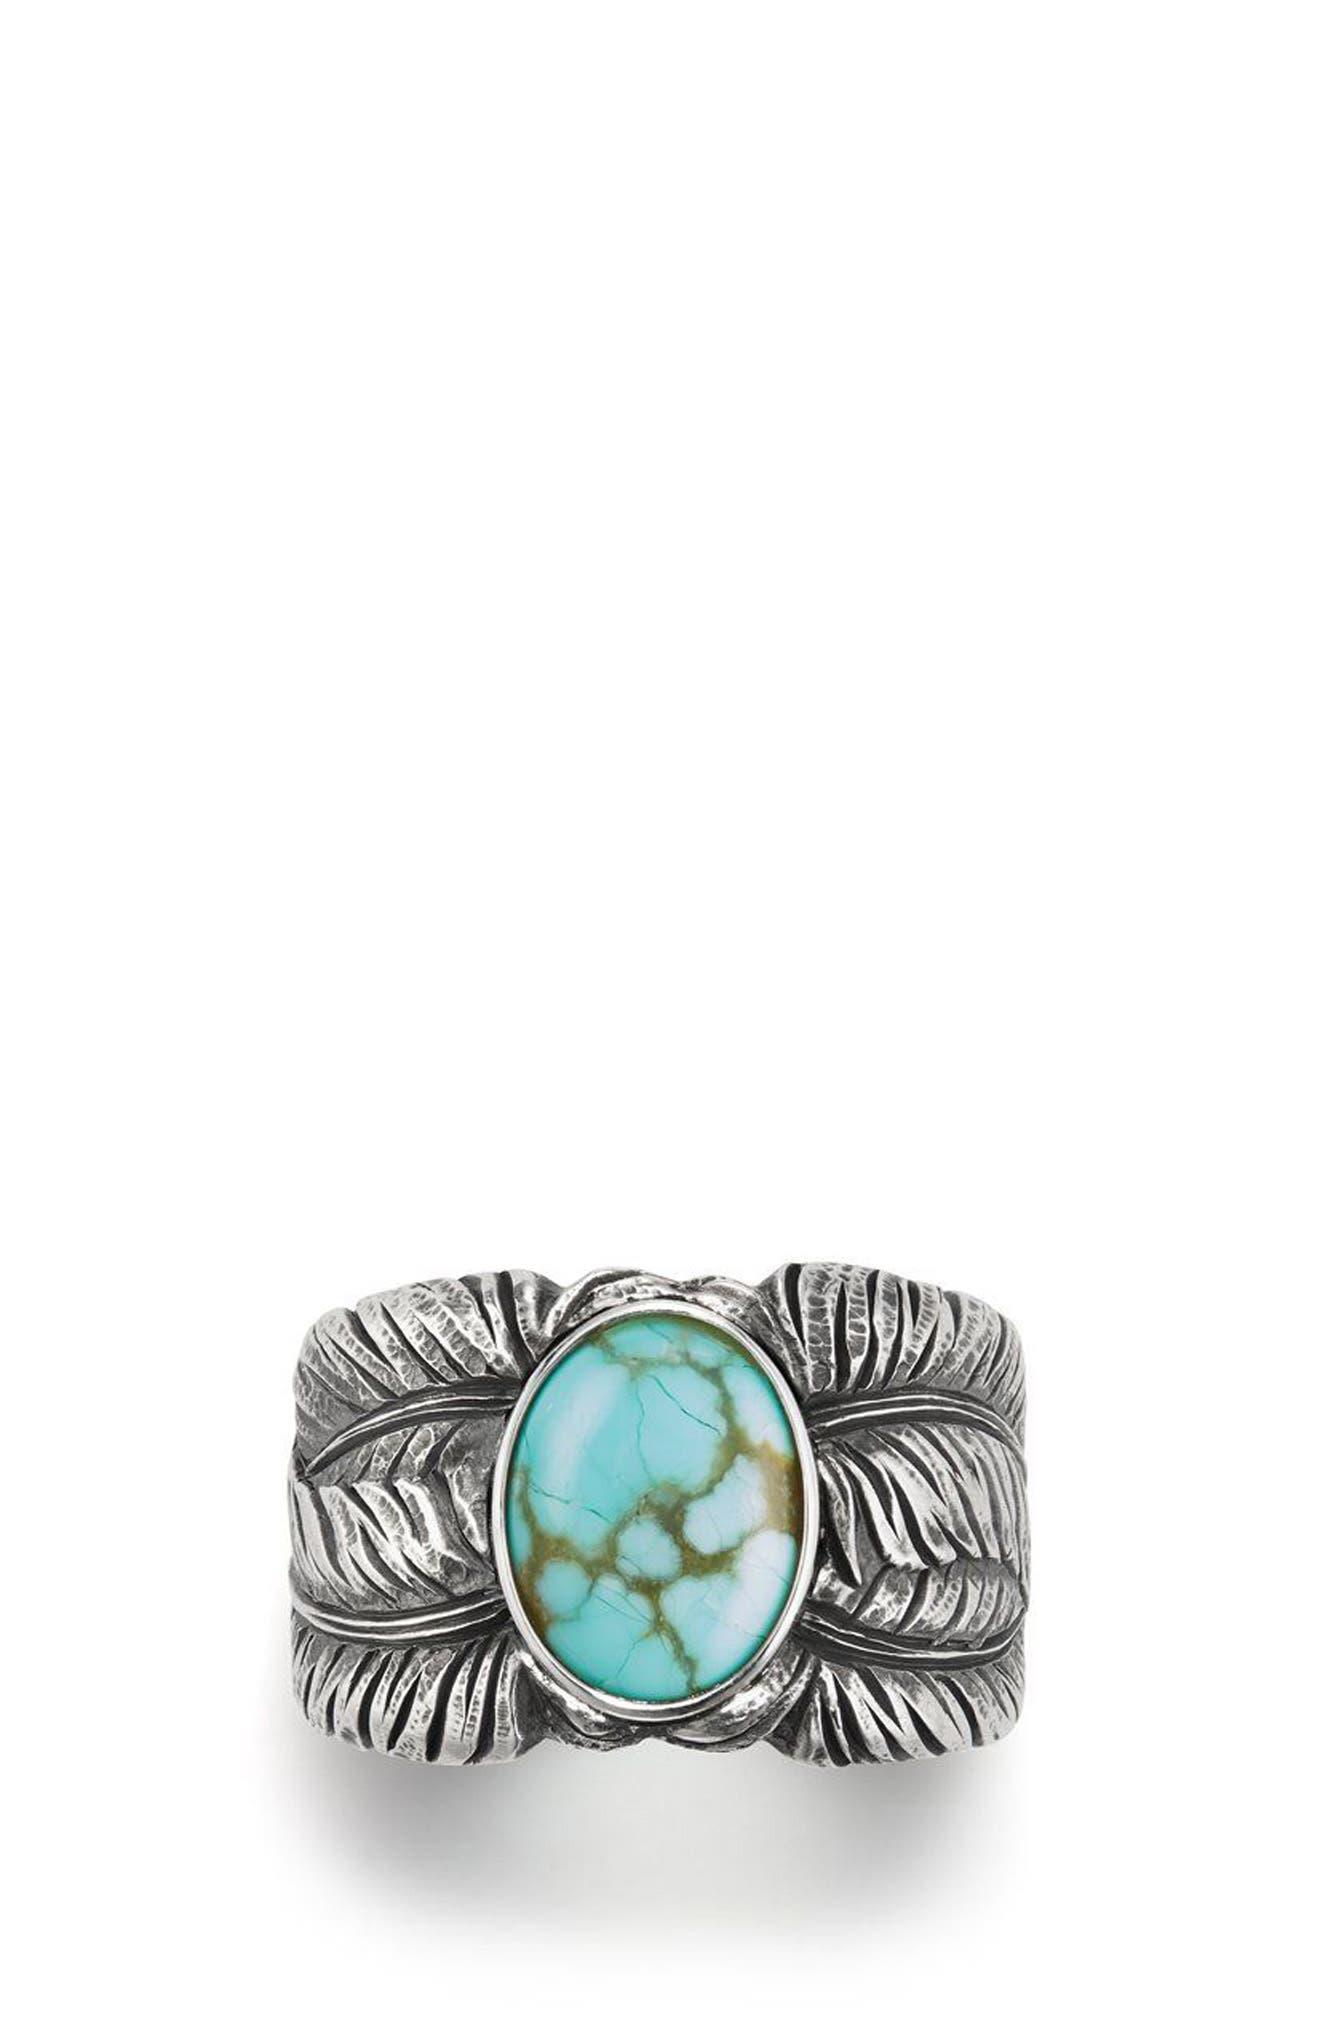 Main Image - David Yurman Southwest Cigar Band Feather Ring with Turquoise